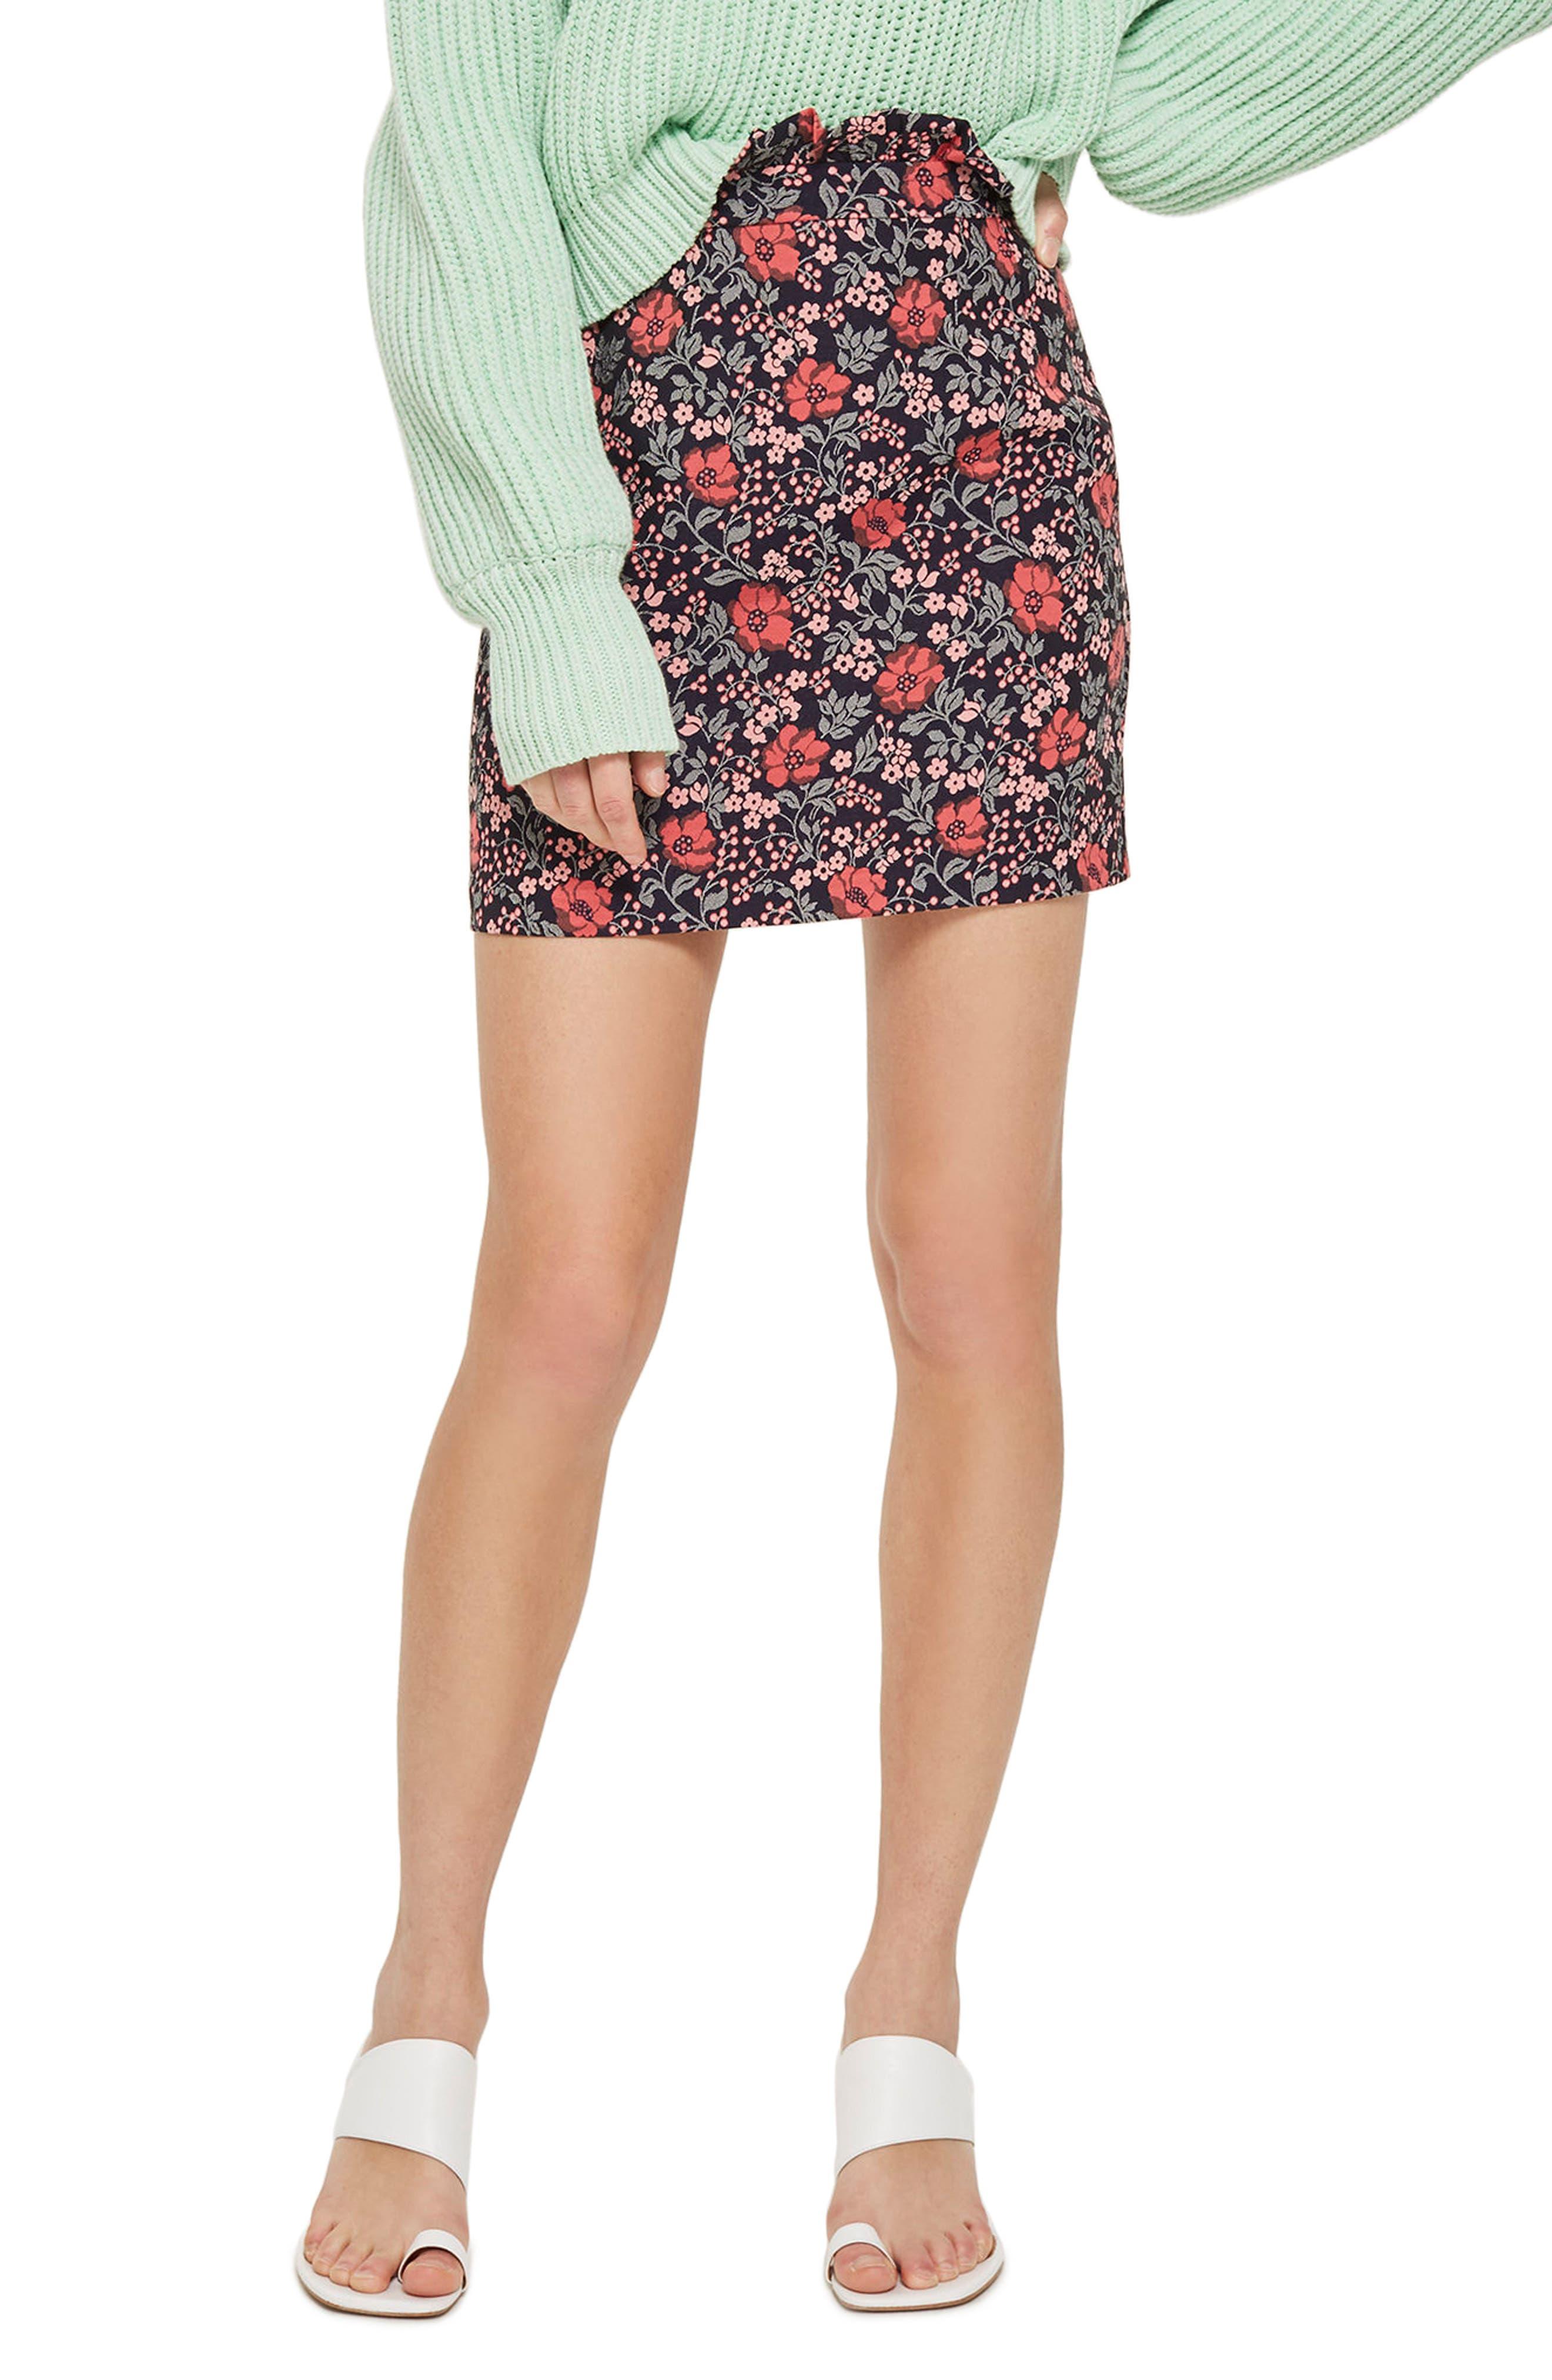 Topshop Poppy Jacquard Miniskirt